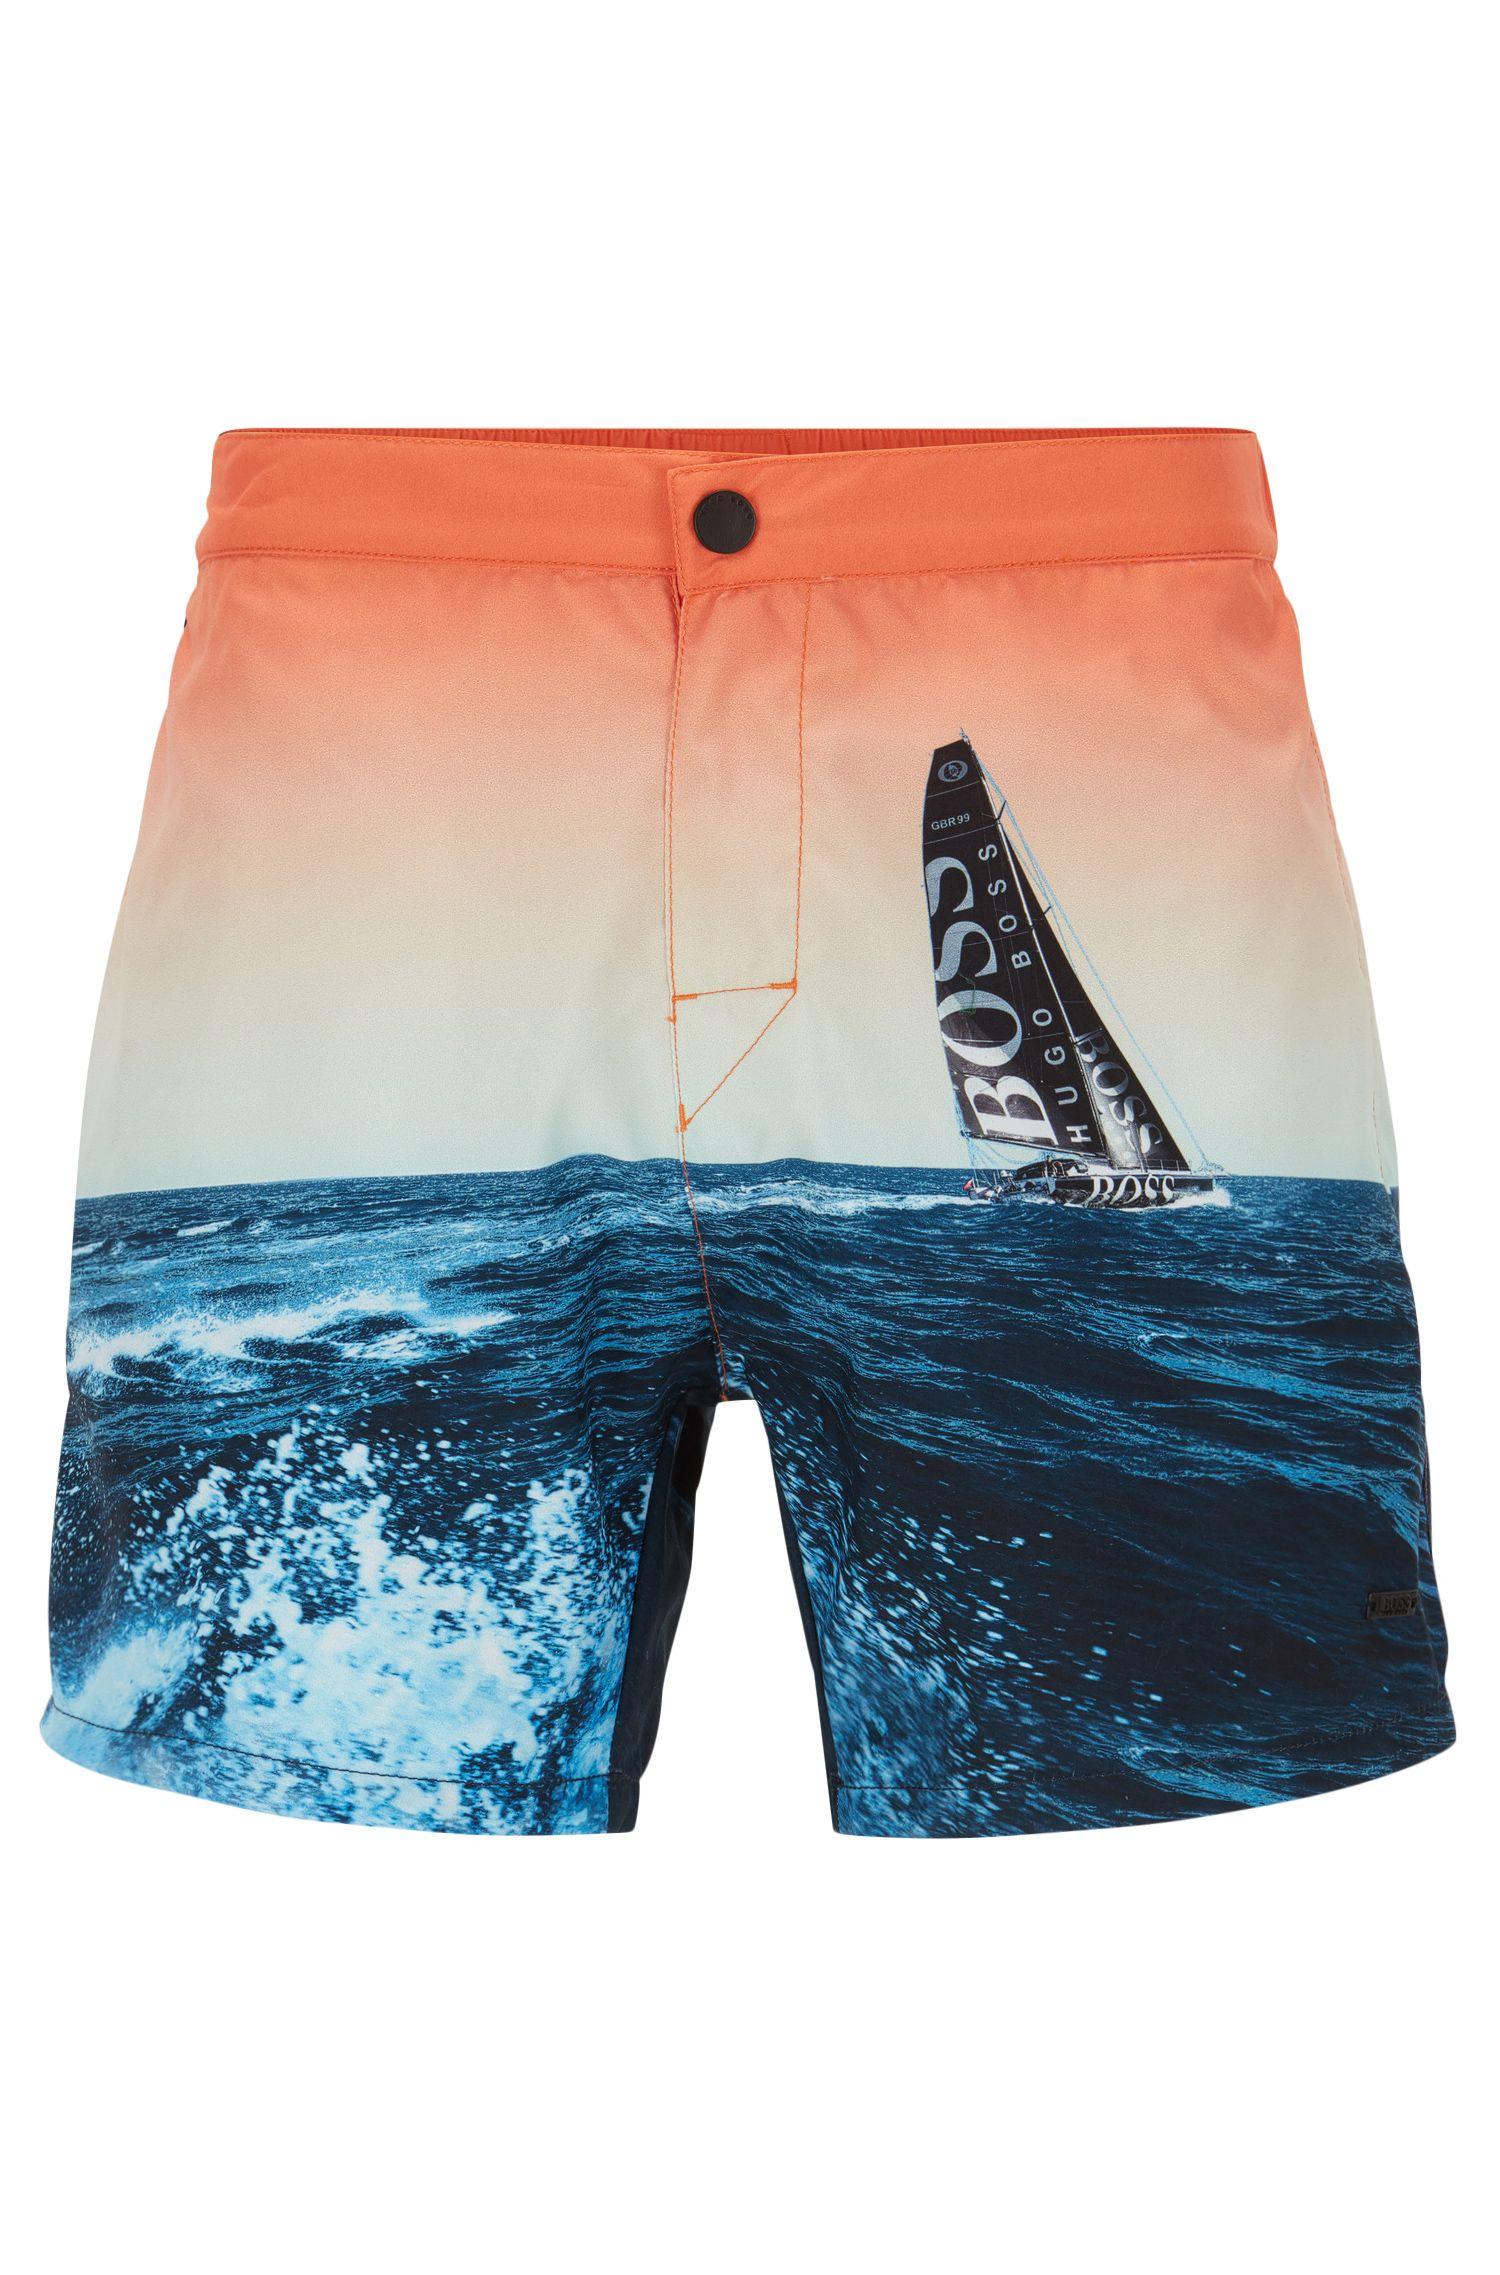 Quick Dry Racing Swim Trunks | Blackfish